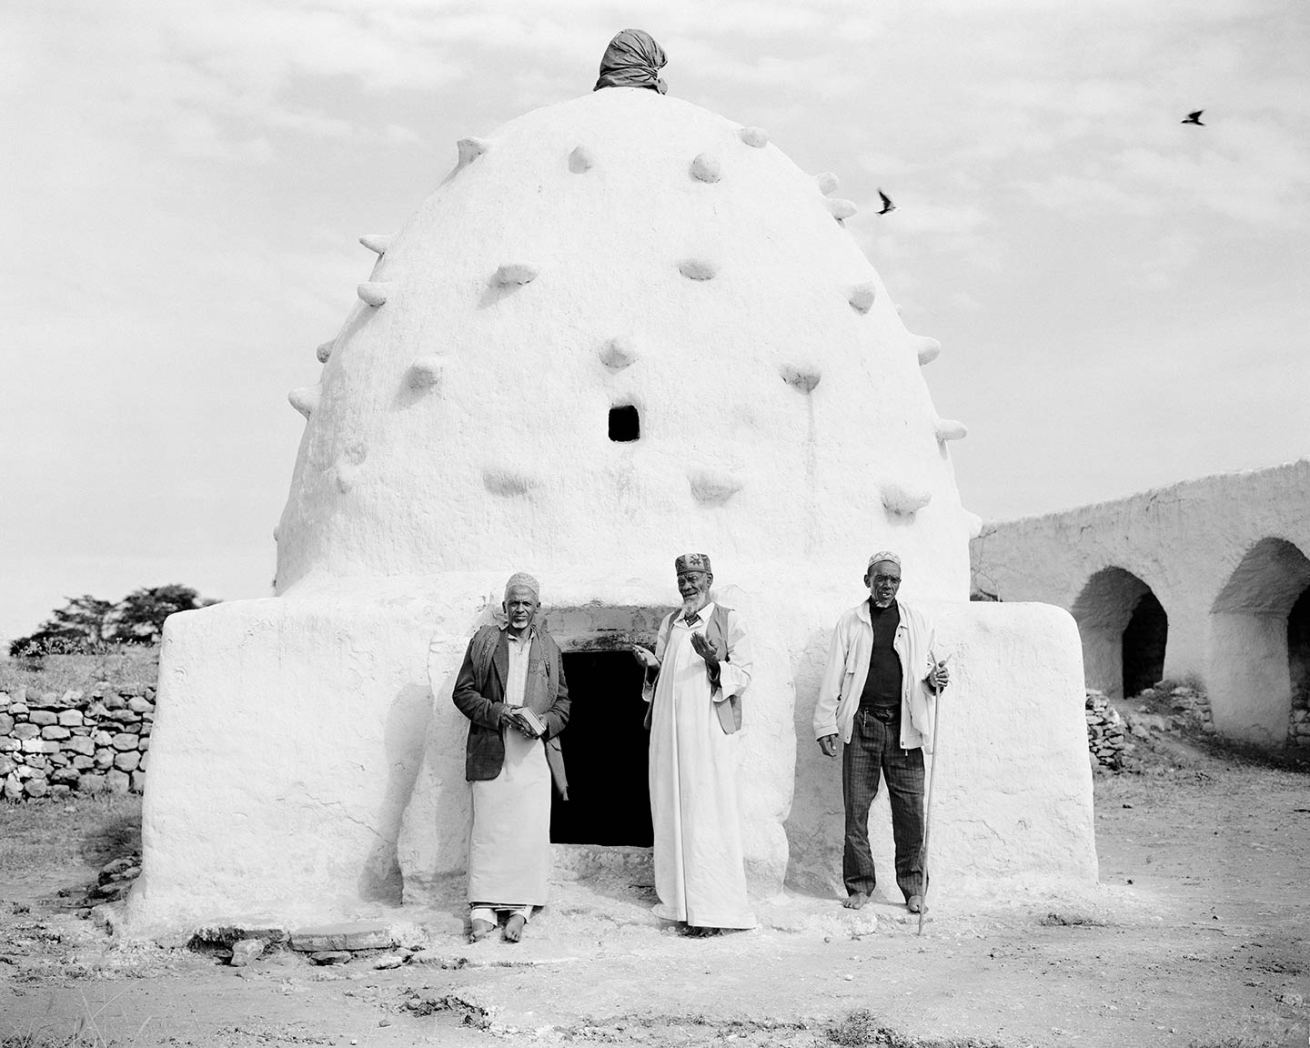 "Dire Sheikh Hussein: in front of Sheikh Abdel Kadir shrine, Sheek Mahmud, Sheek Hassan Salyo & Sheek Abdul-Jabbar. 4x5"" Black & White Film"